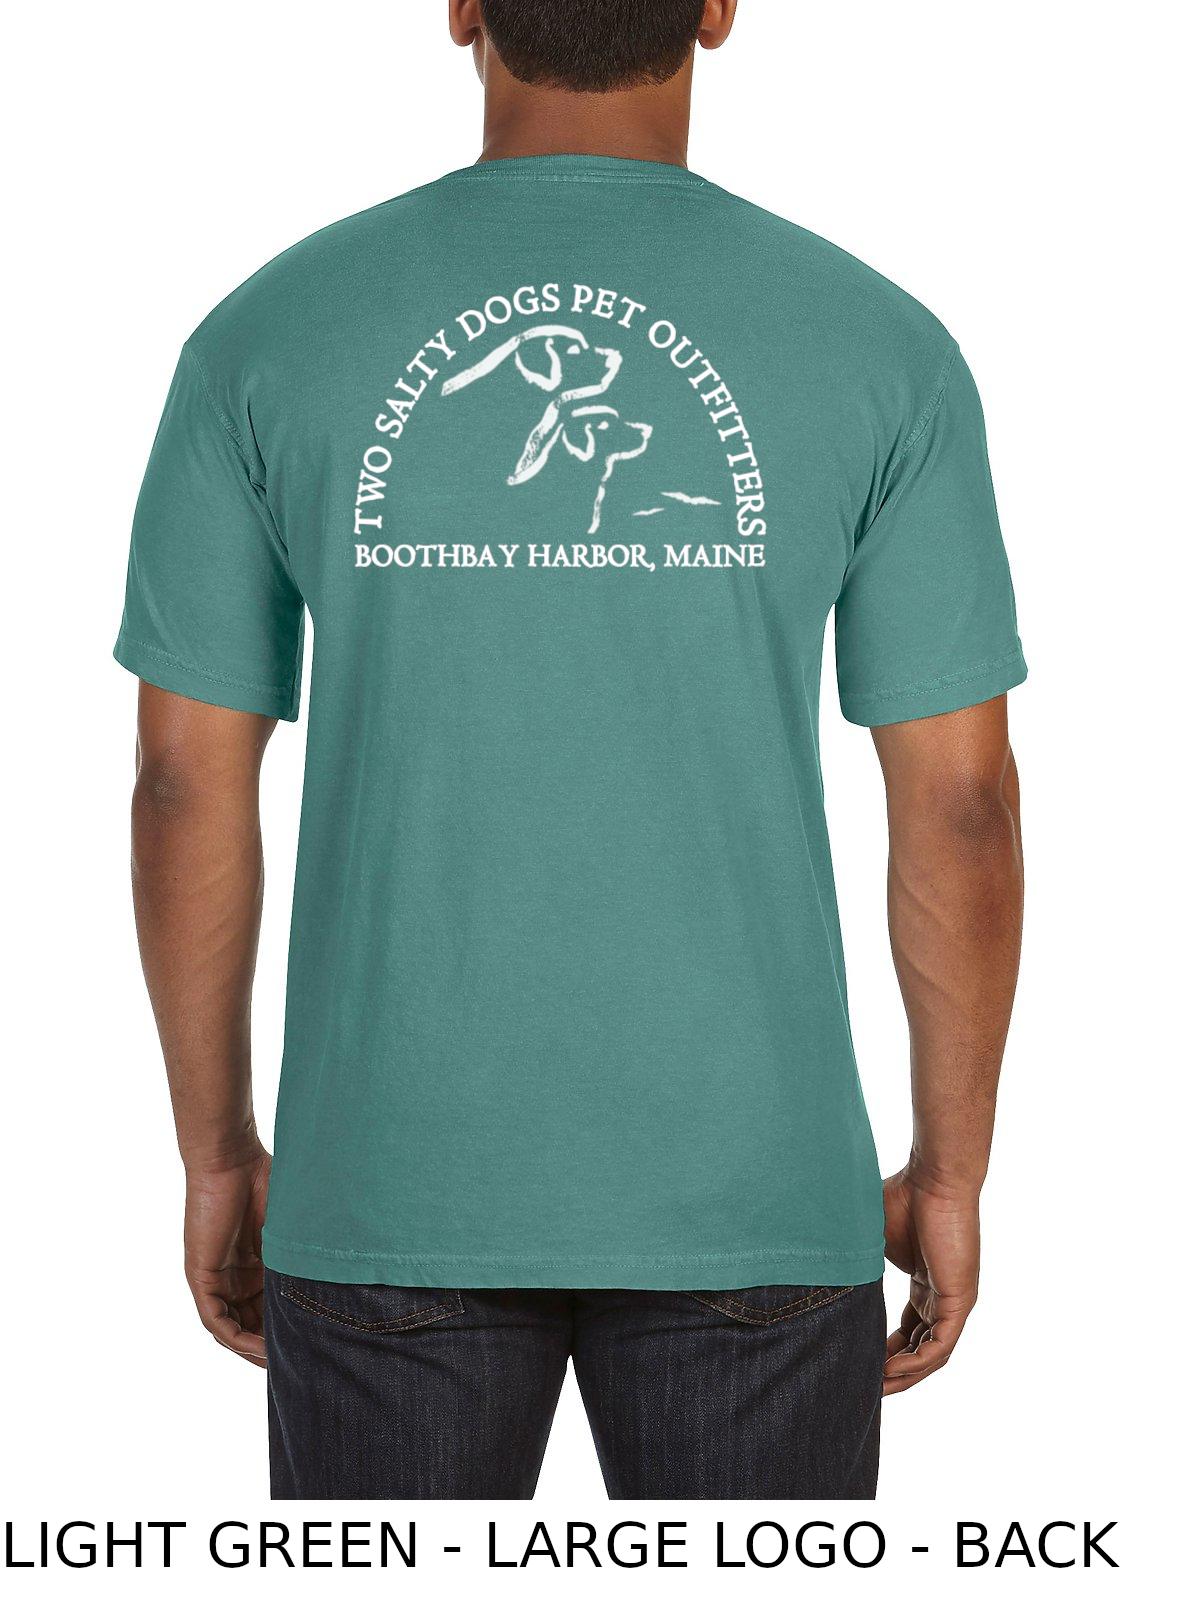 bbha-ss-t-shirt-pocket-light-green-back